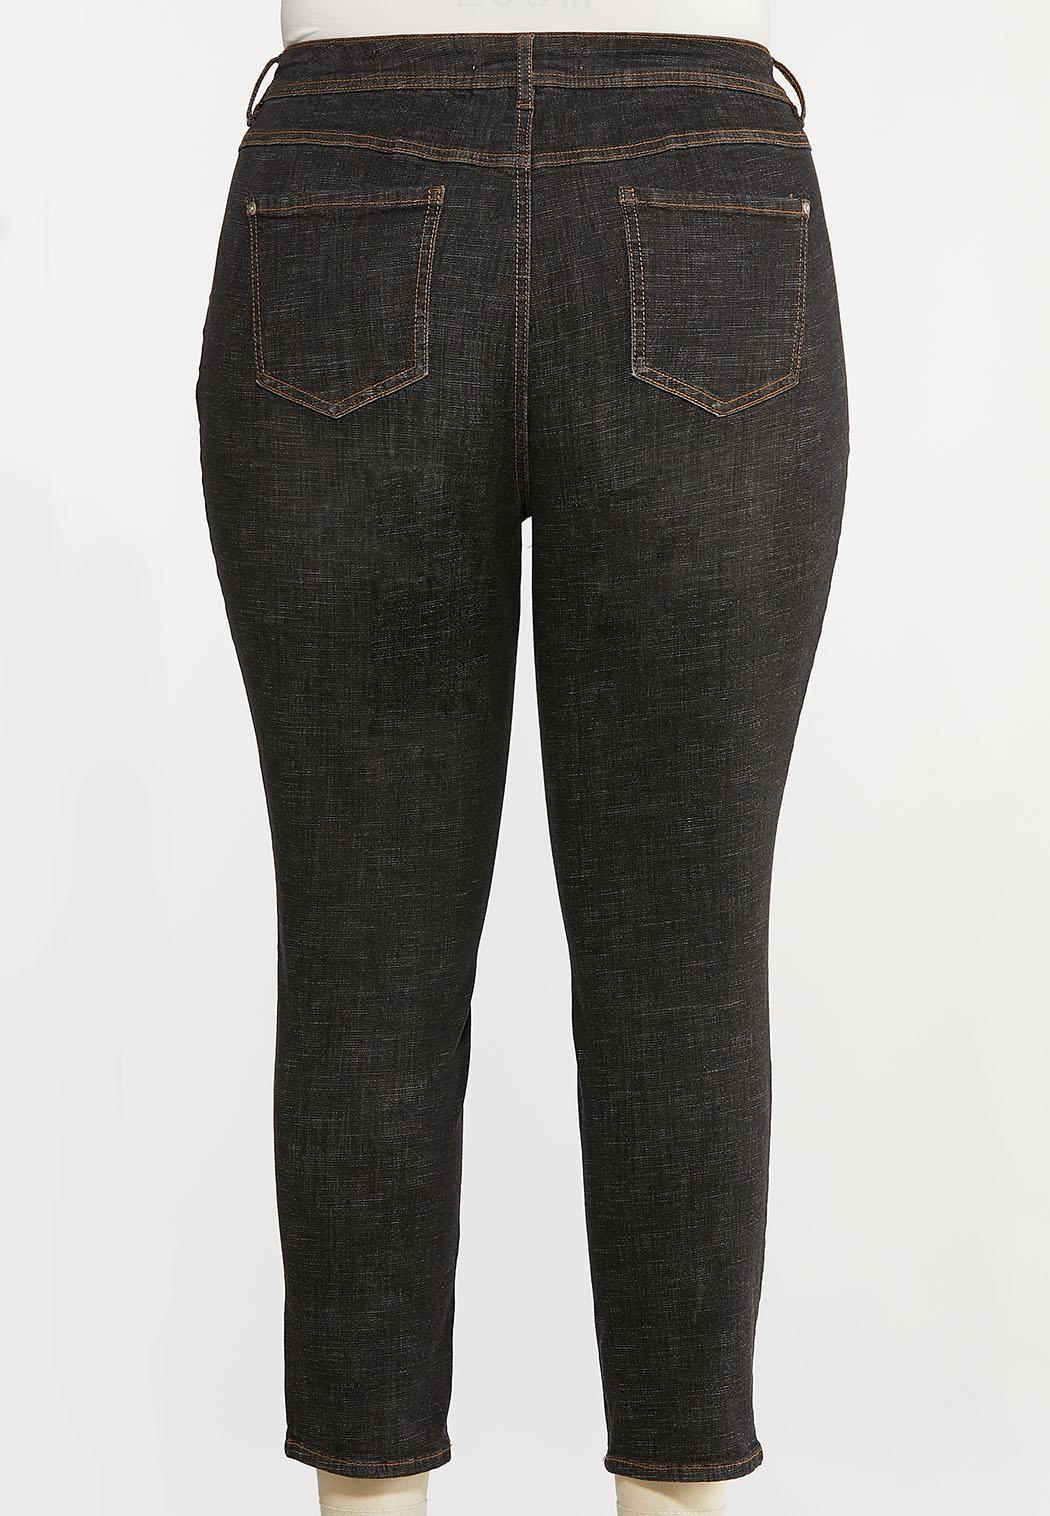 Plus Size Black High Waist Jeans (Item #44072285)